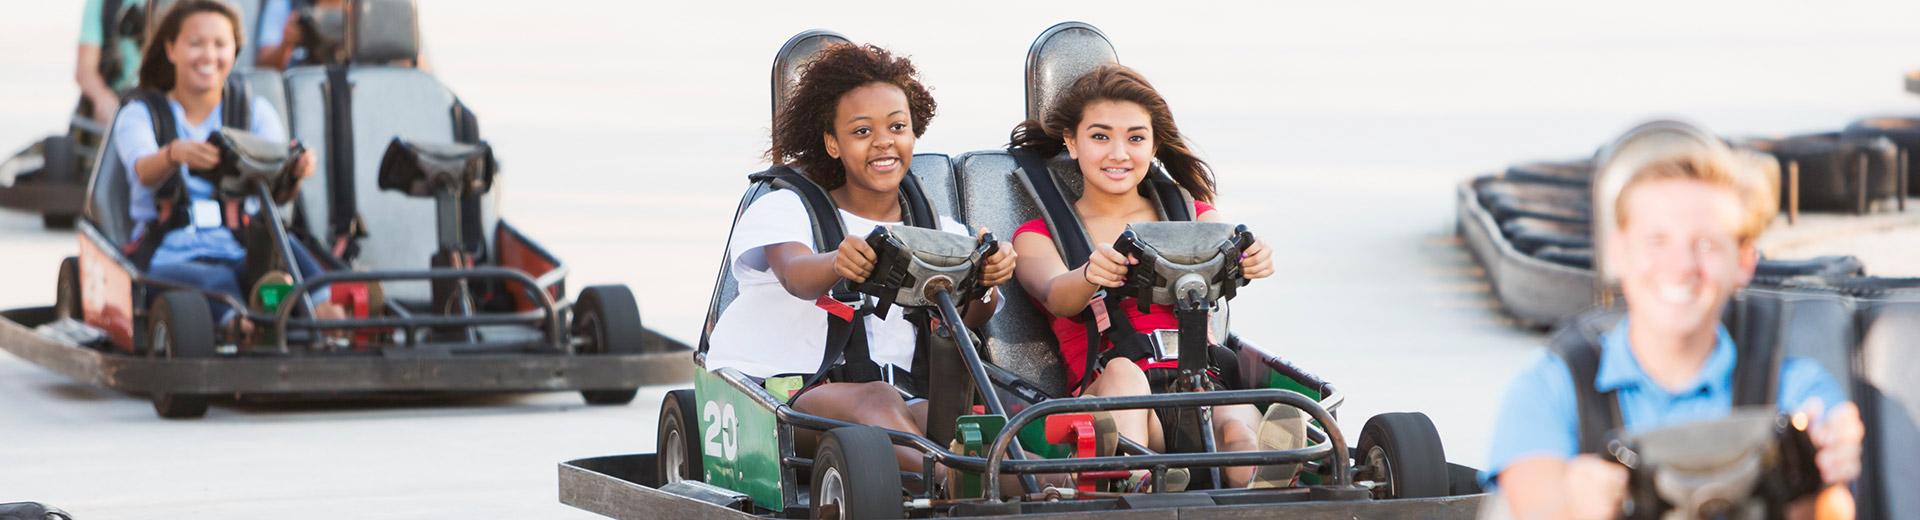 Go Karts Jacksonville Fl >> Adventure Landing Family Fun Entertainment Centers & Water ...